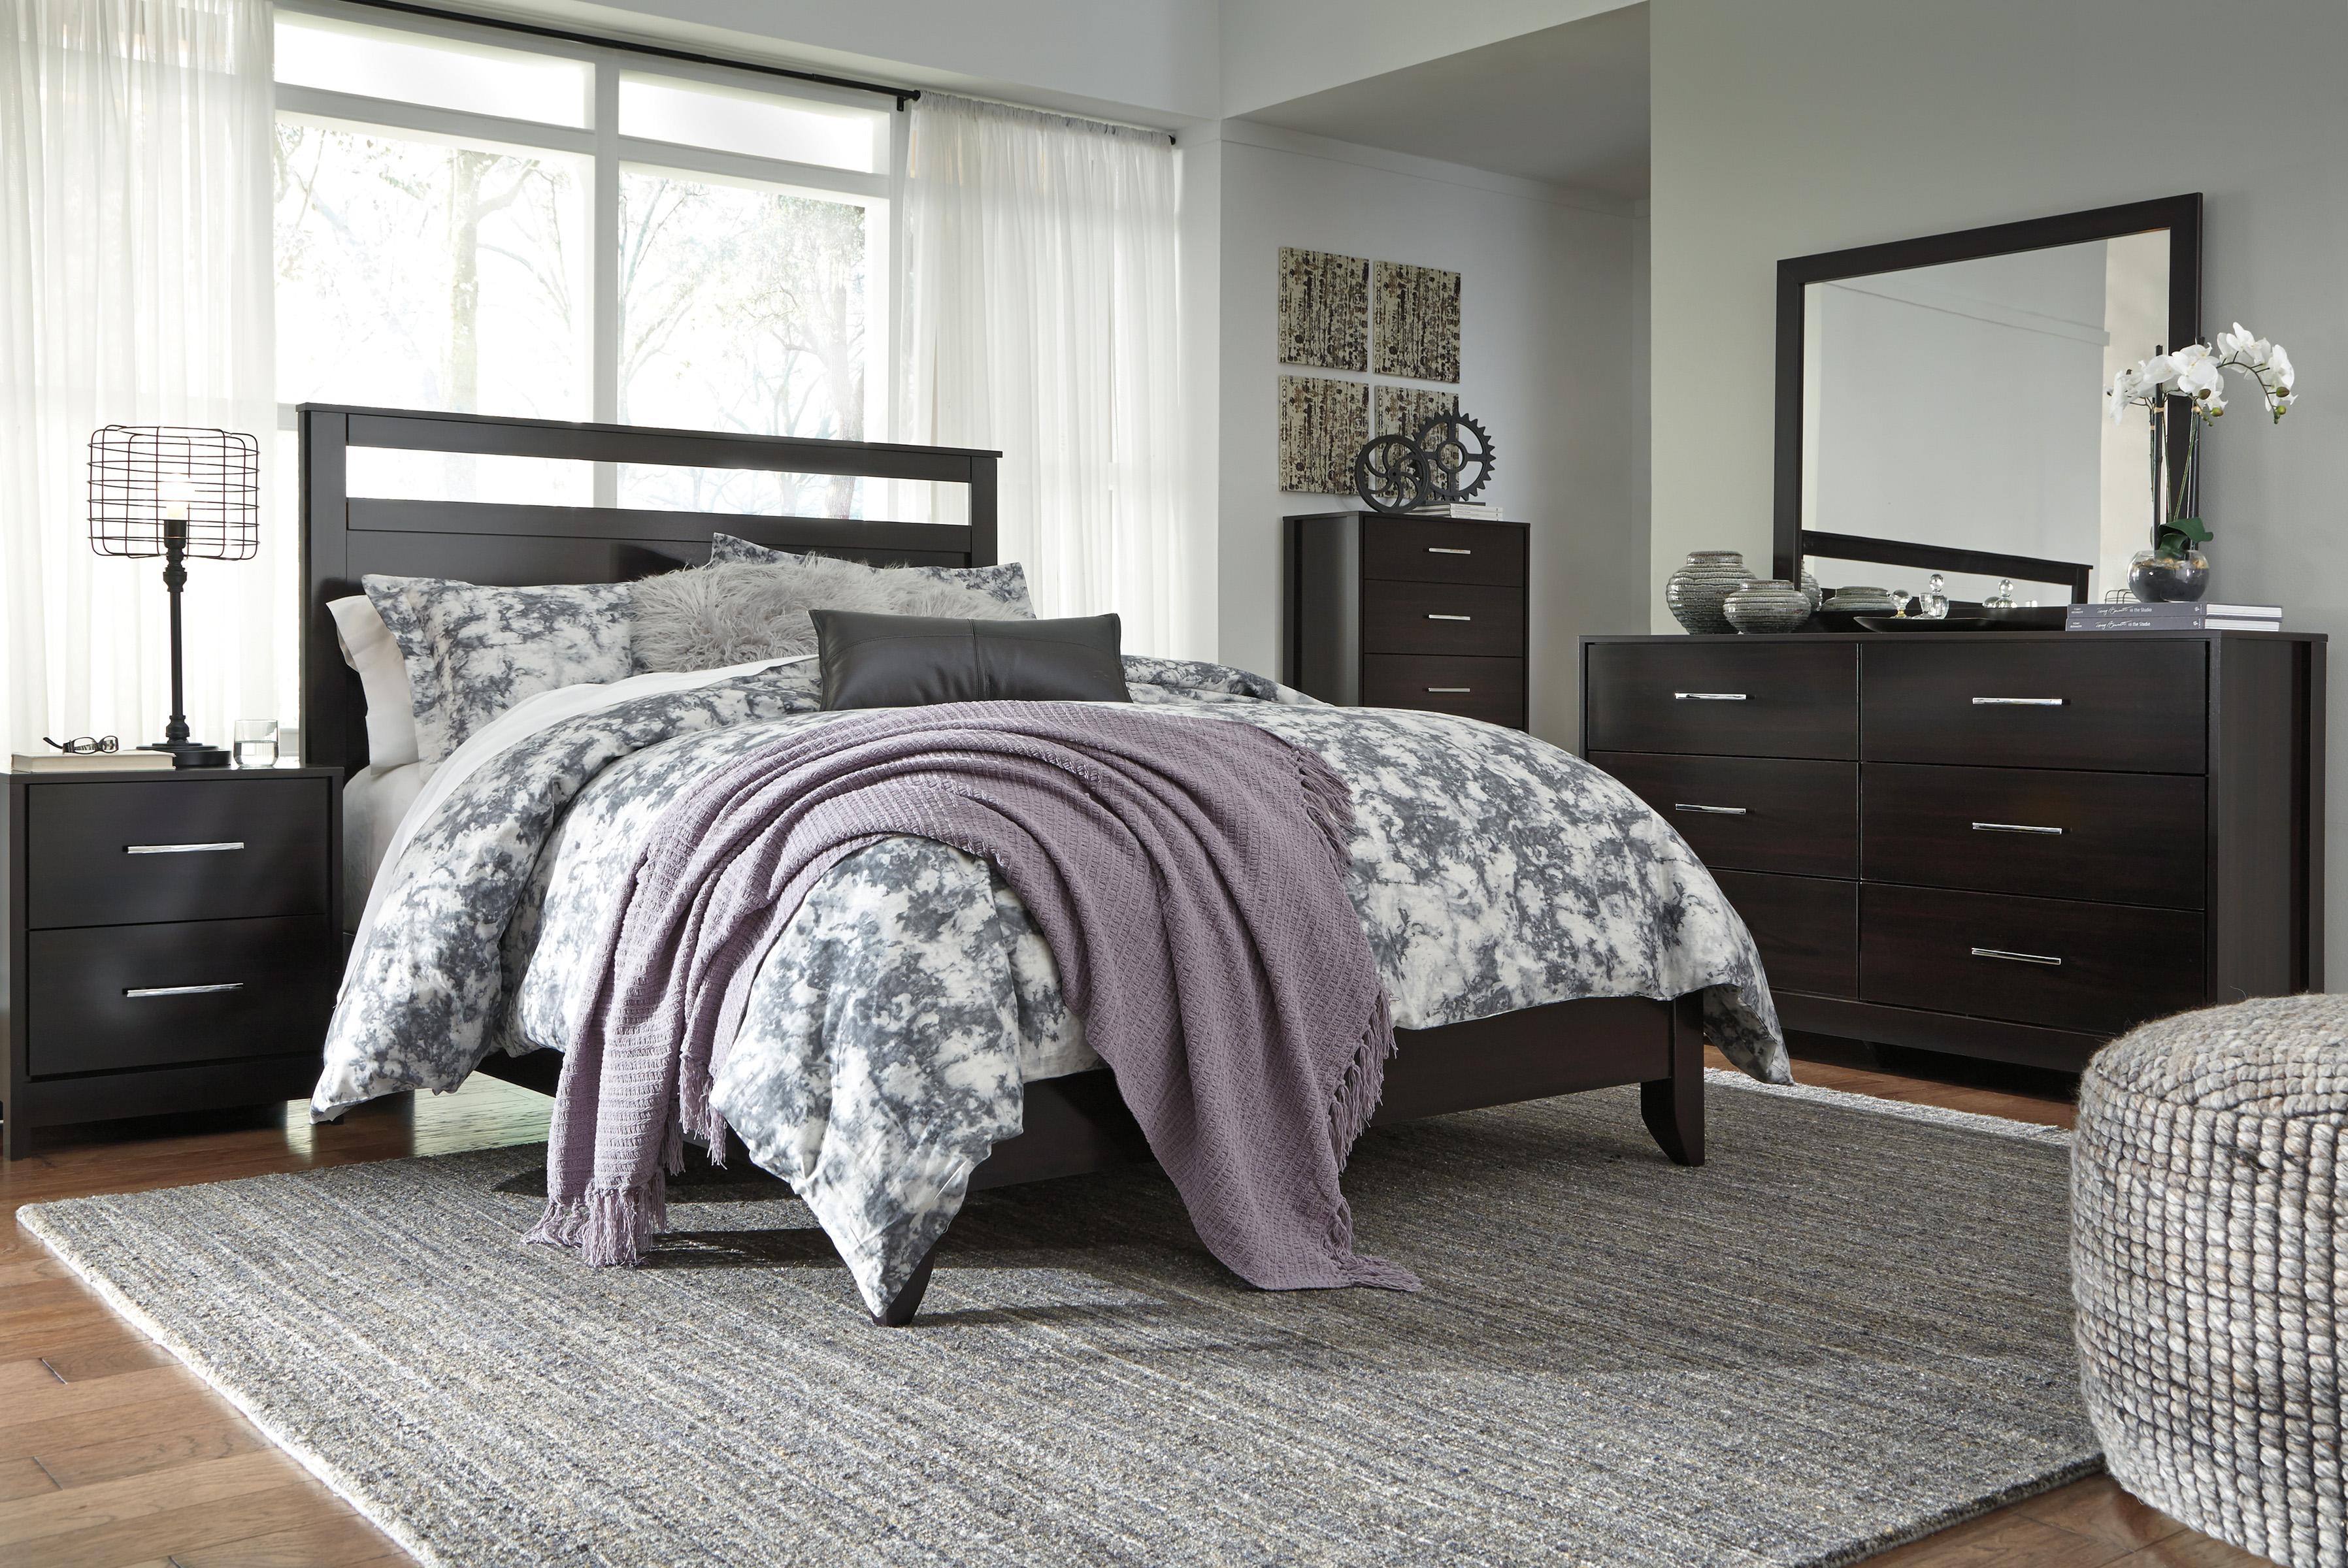 Agella Full/Queen Headboard, Dresser, Mirror & Nightstand  / $21.99 A Week